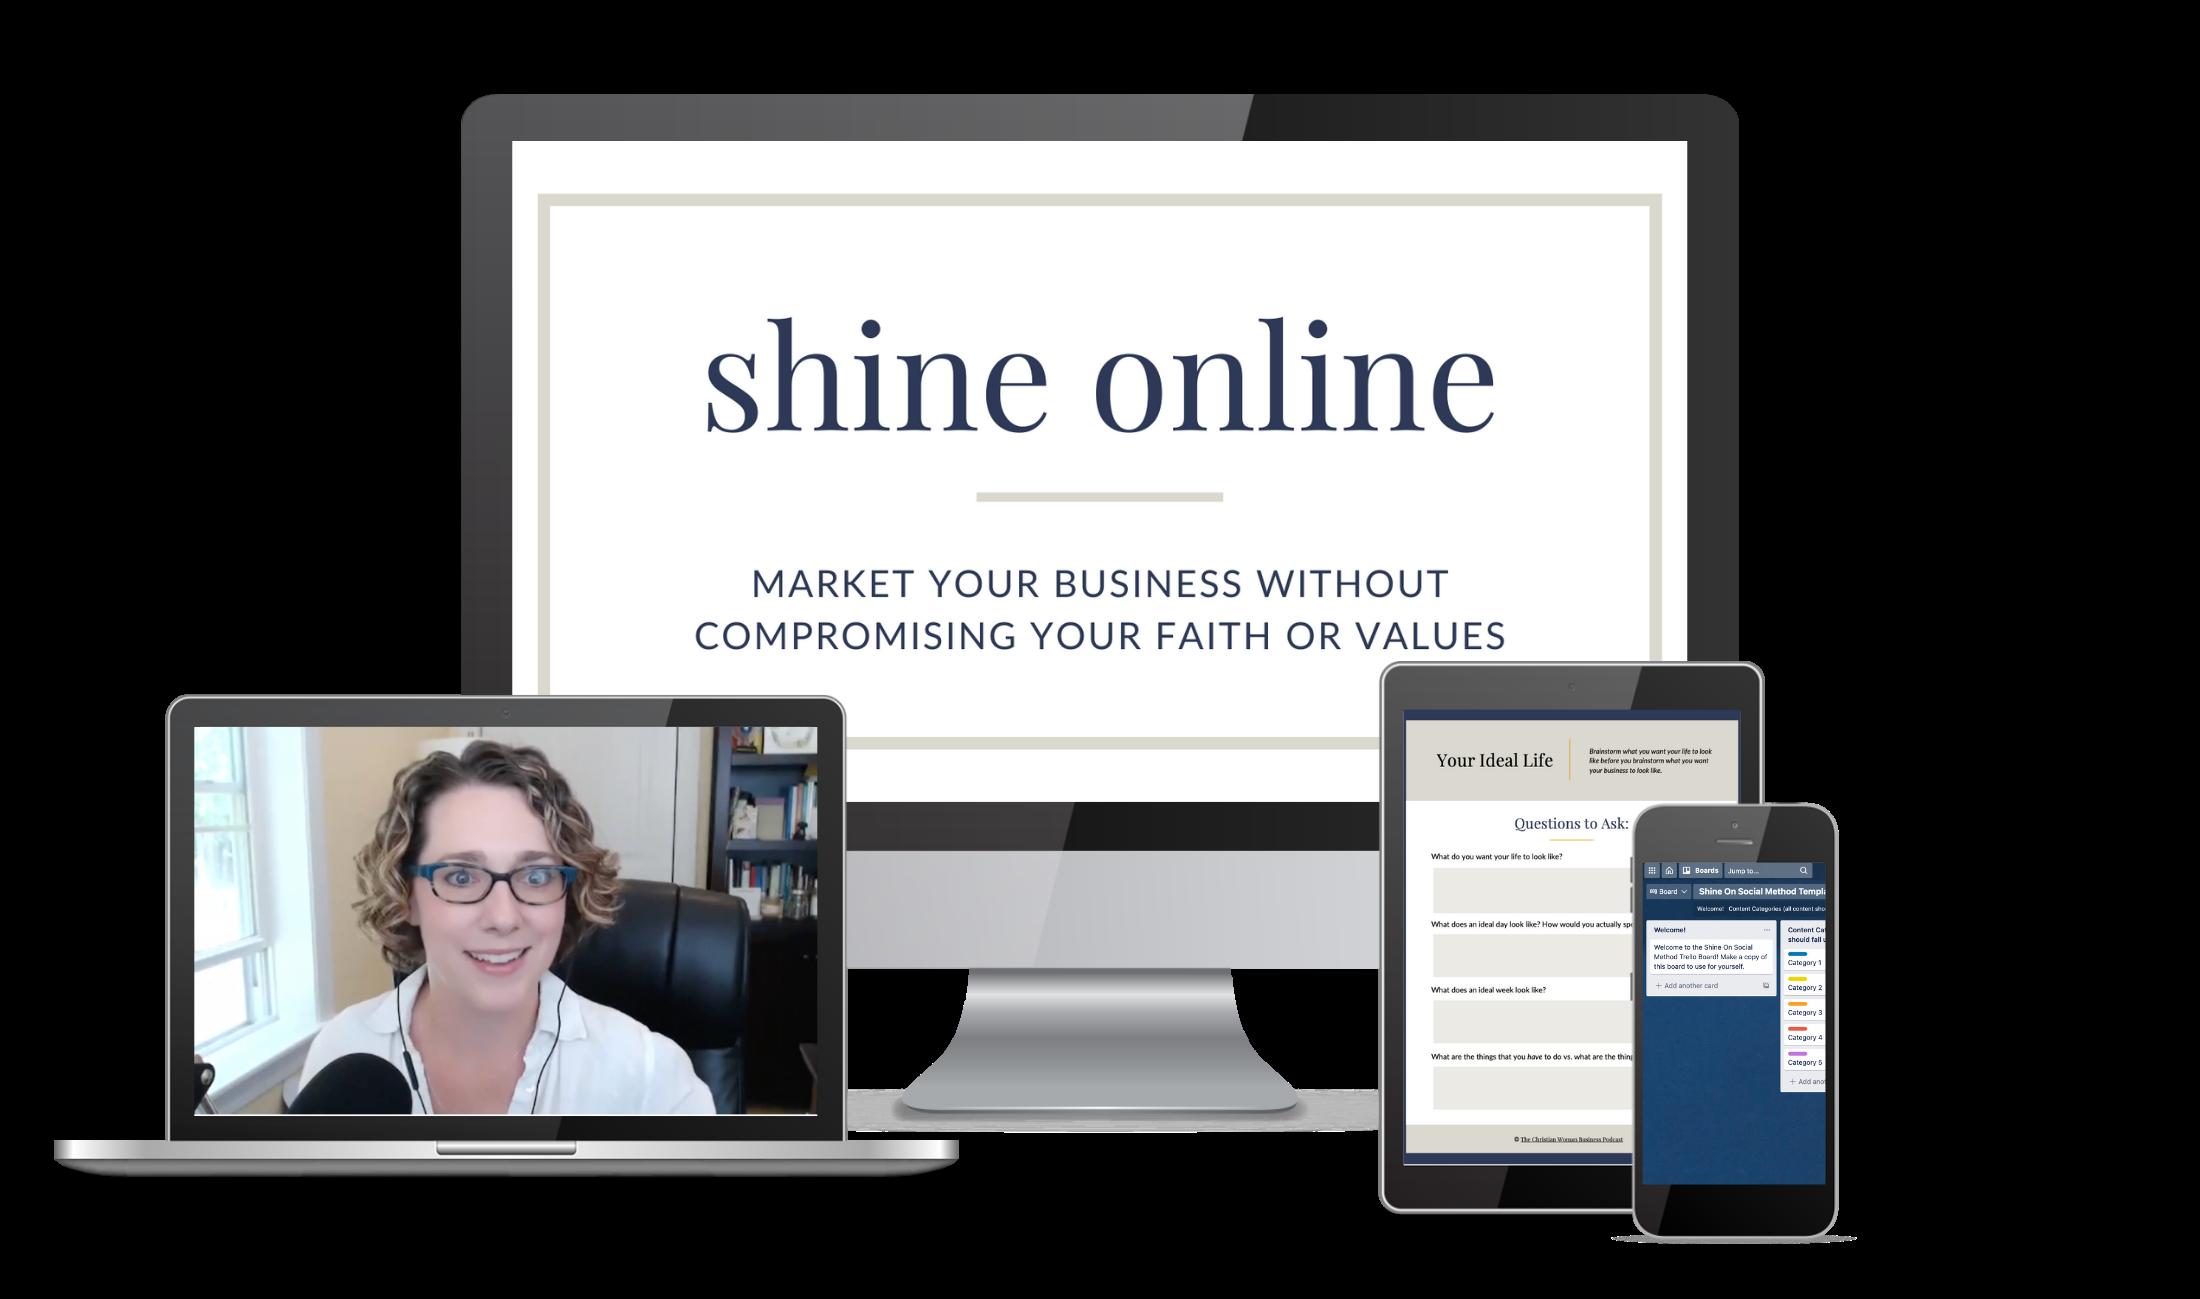 shine online course